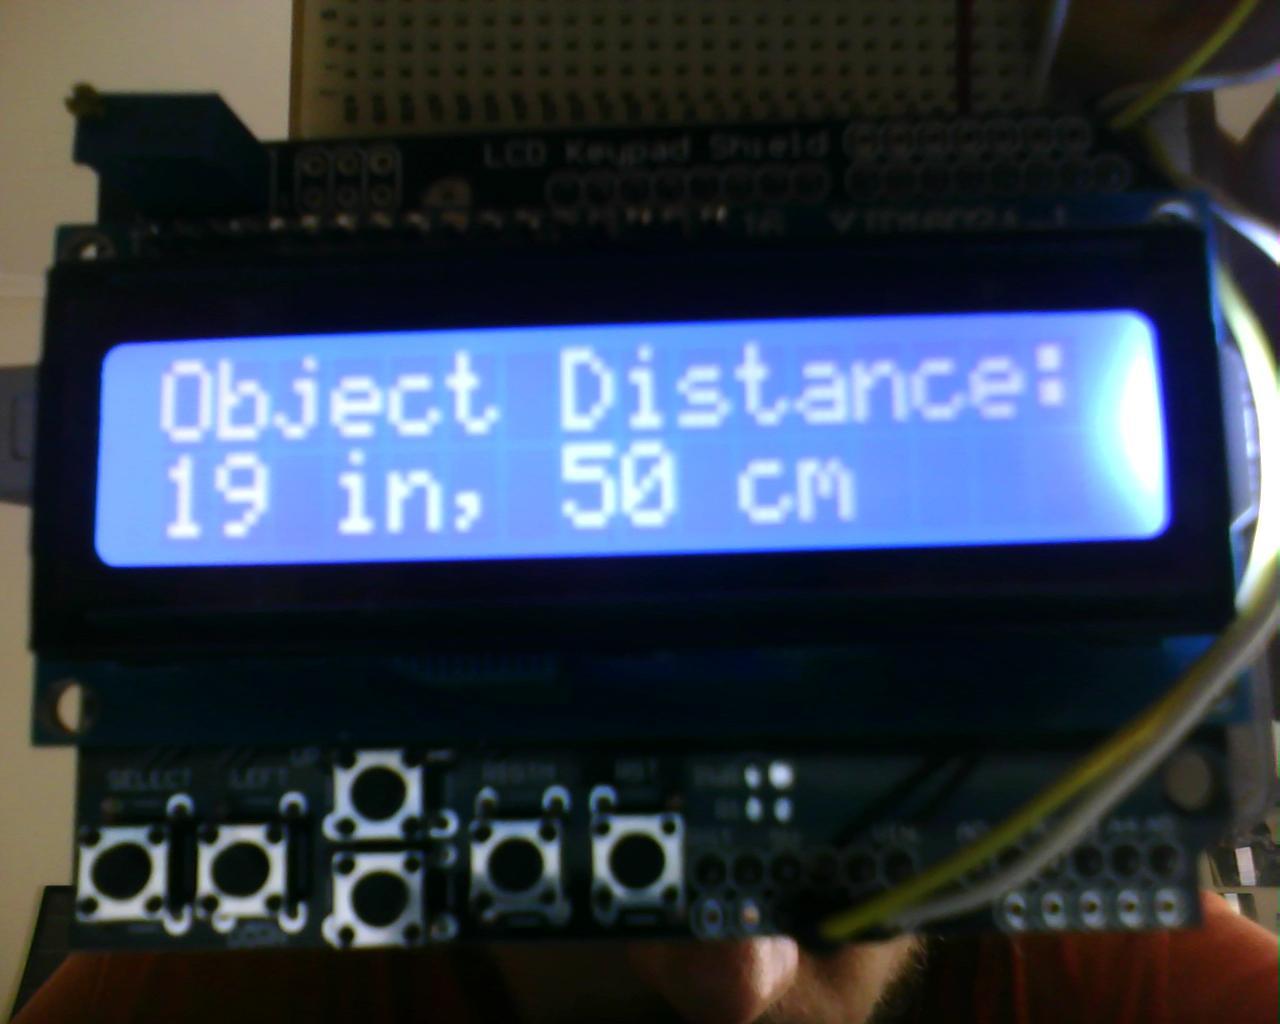 Arduino vehicle parking helper with ultrasonic sensor and